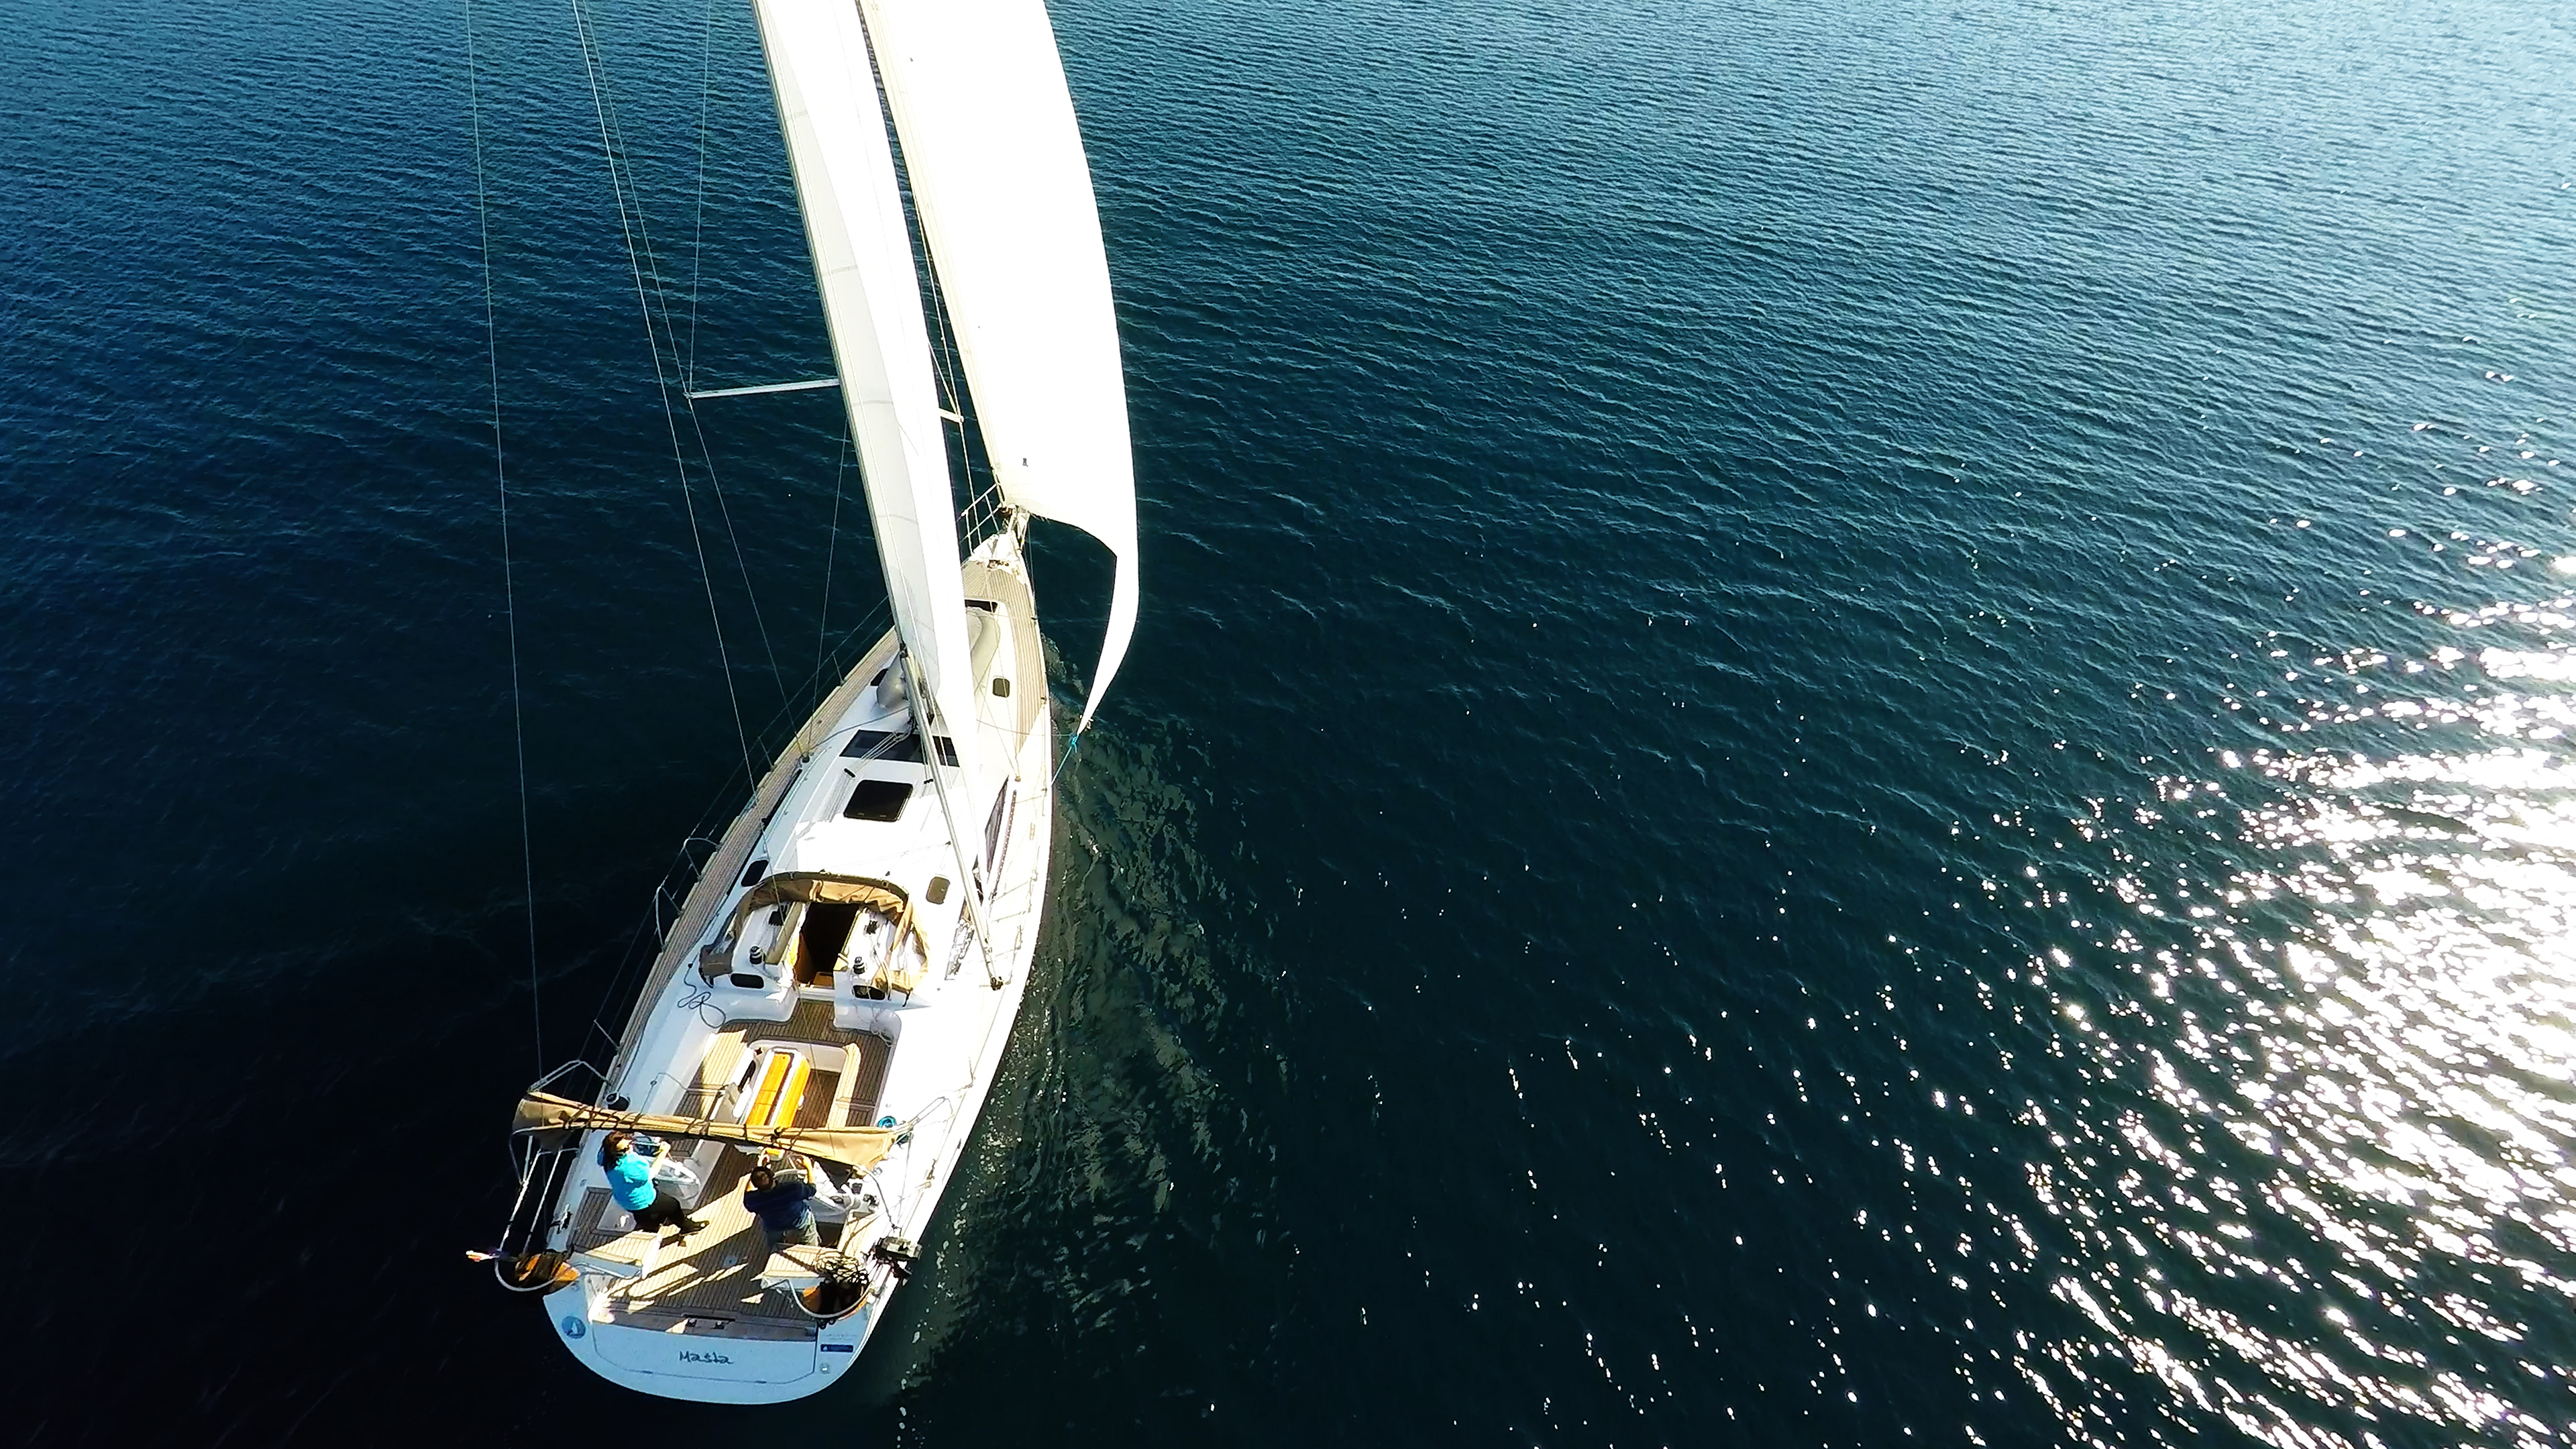 barcha a vela yacht a vela elan 45 impression vele timoni ruota ponte barca a vela